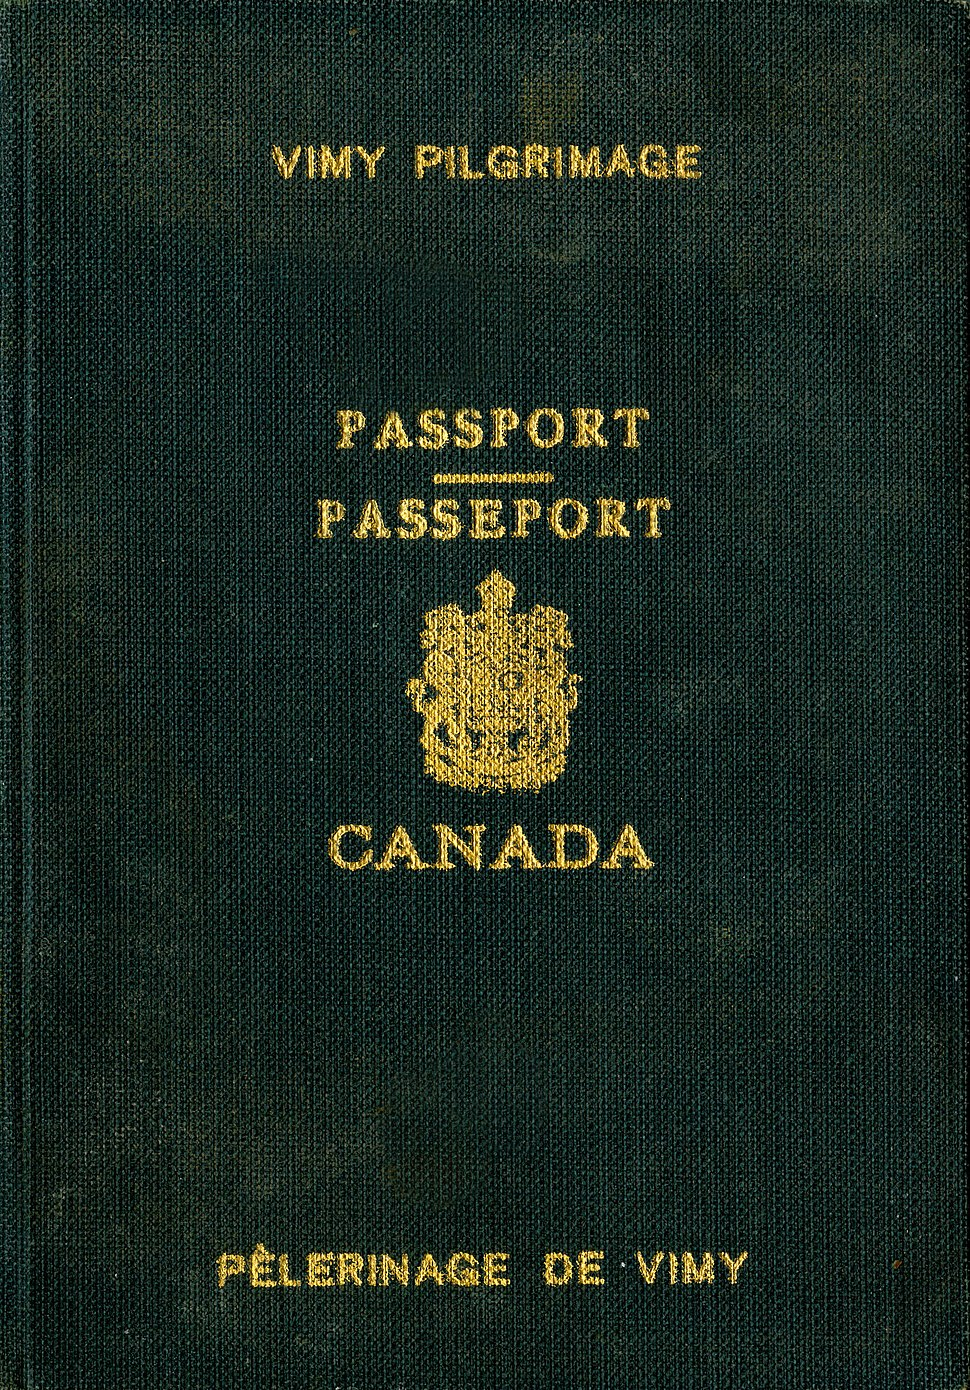 1936 Vimy pilgrimage passport